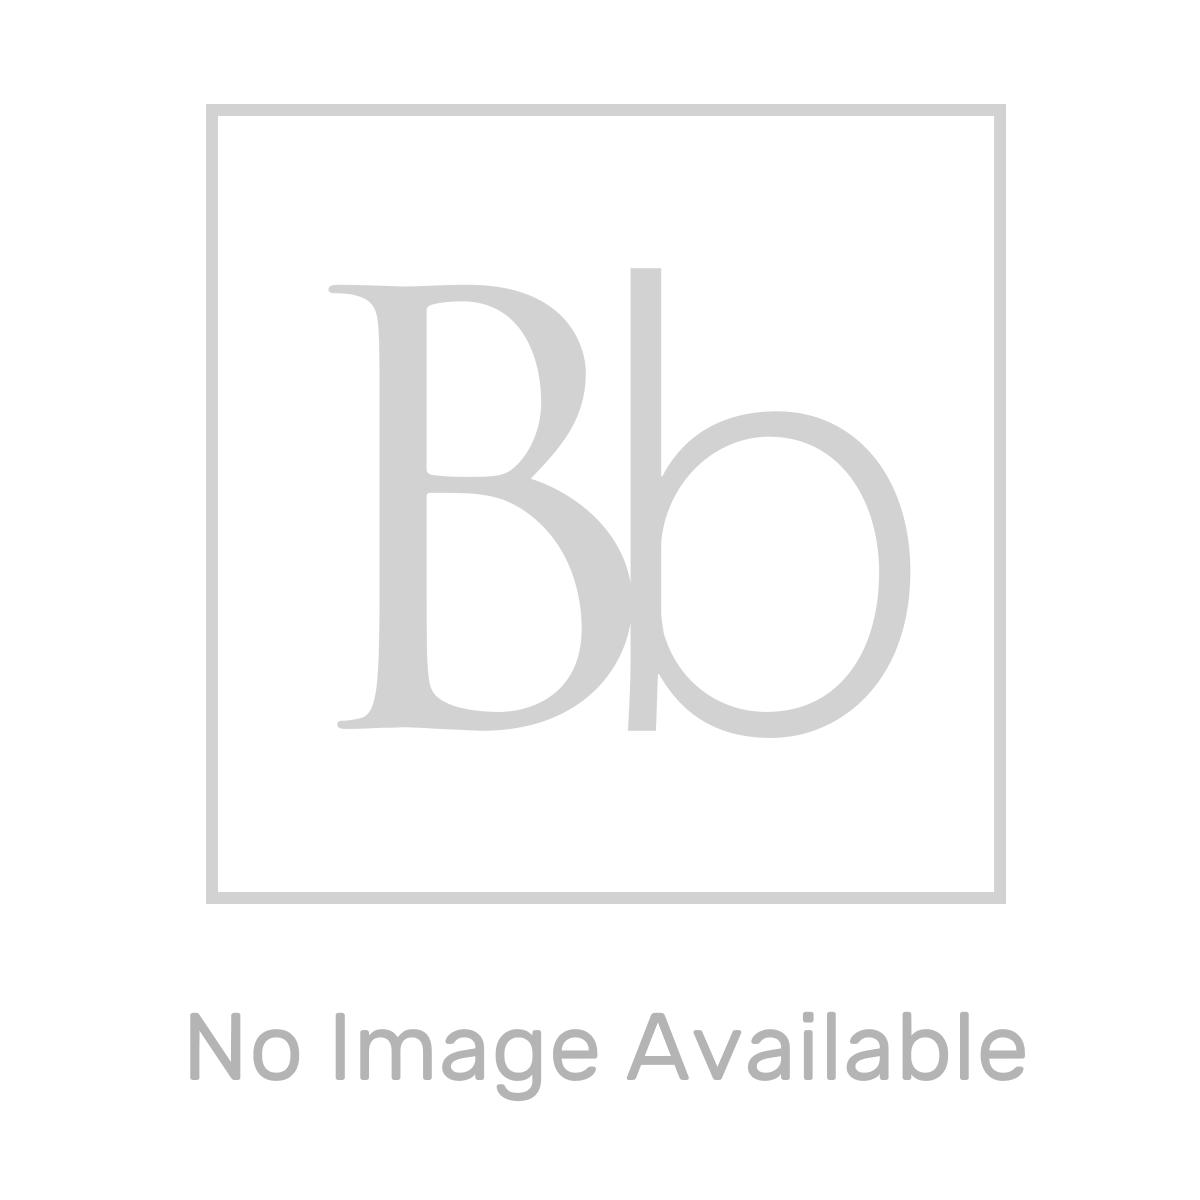 Frontline Standard Offset Quadrant Shower Tray 1200 x 900mm Right Handed